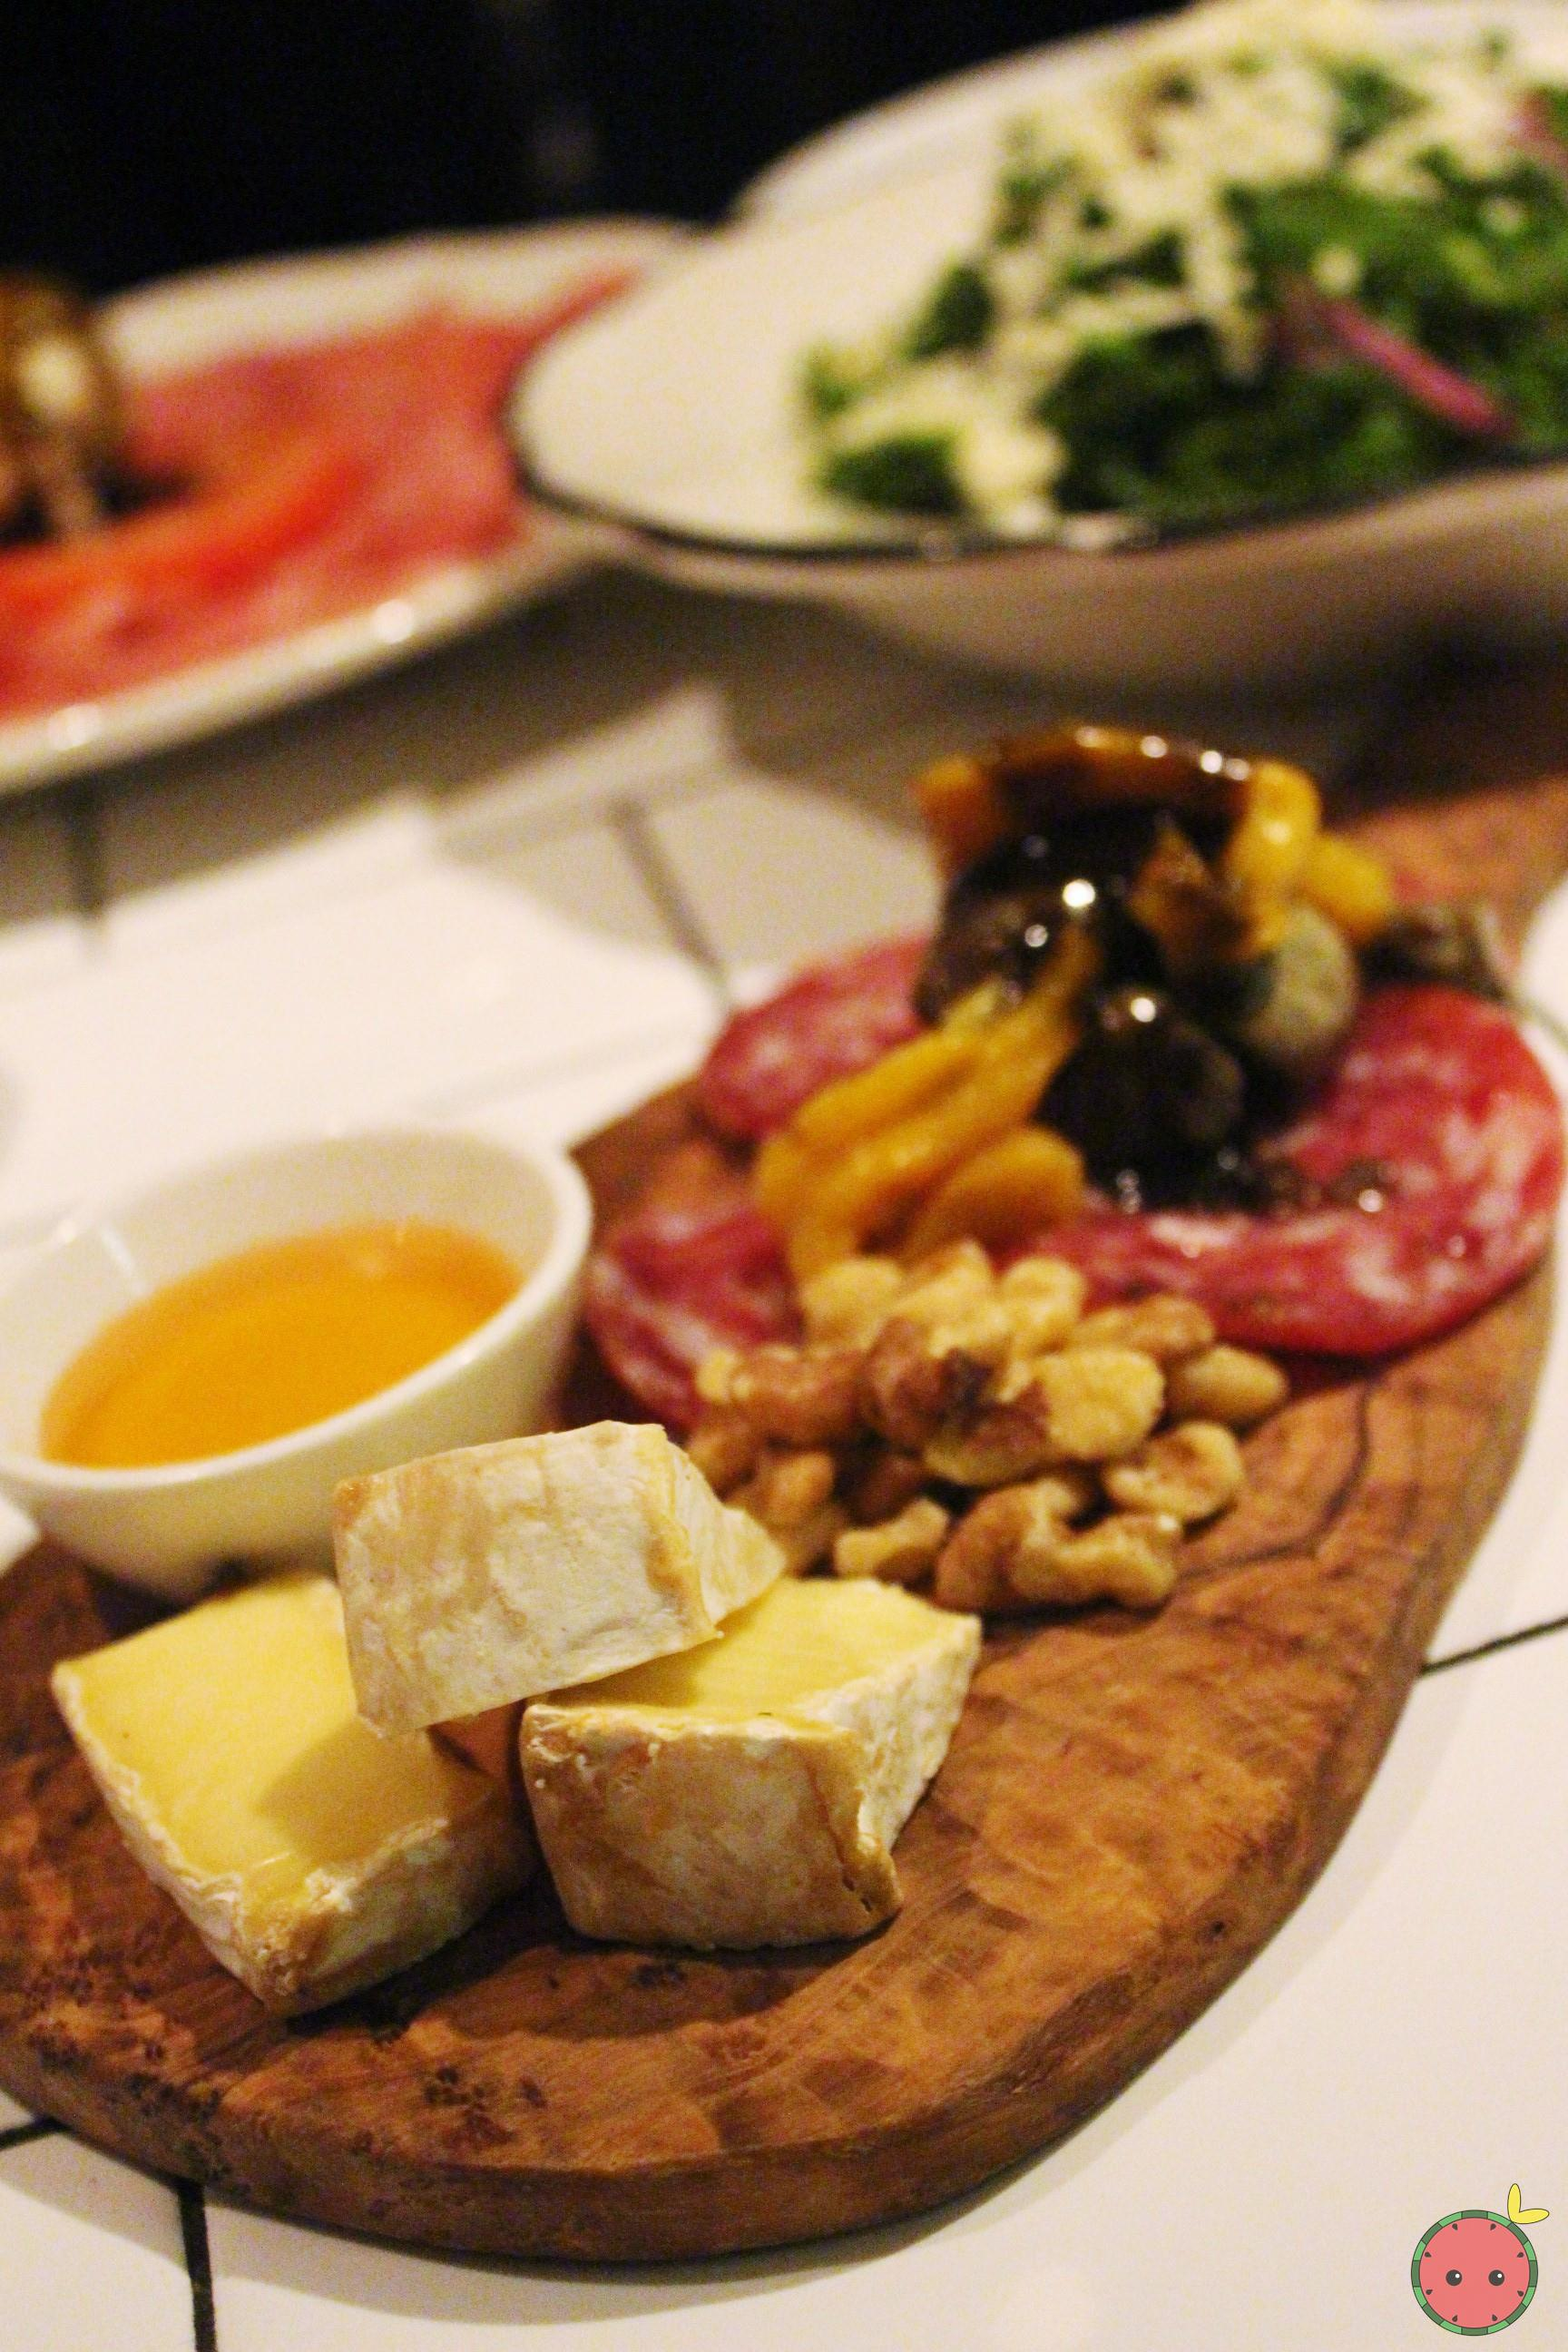 Sopressata and camembert